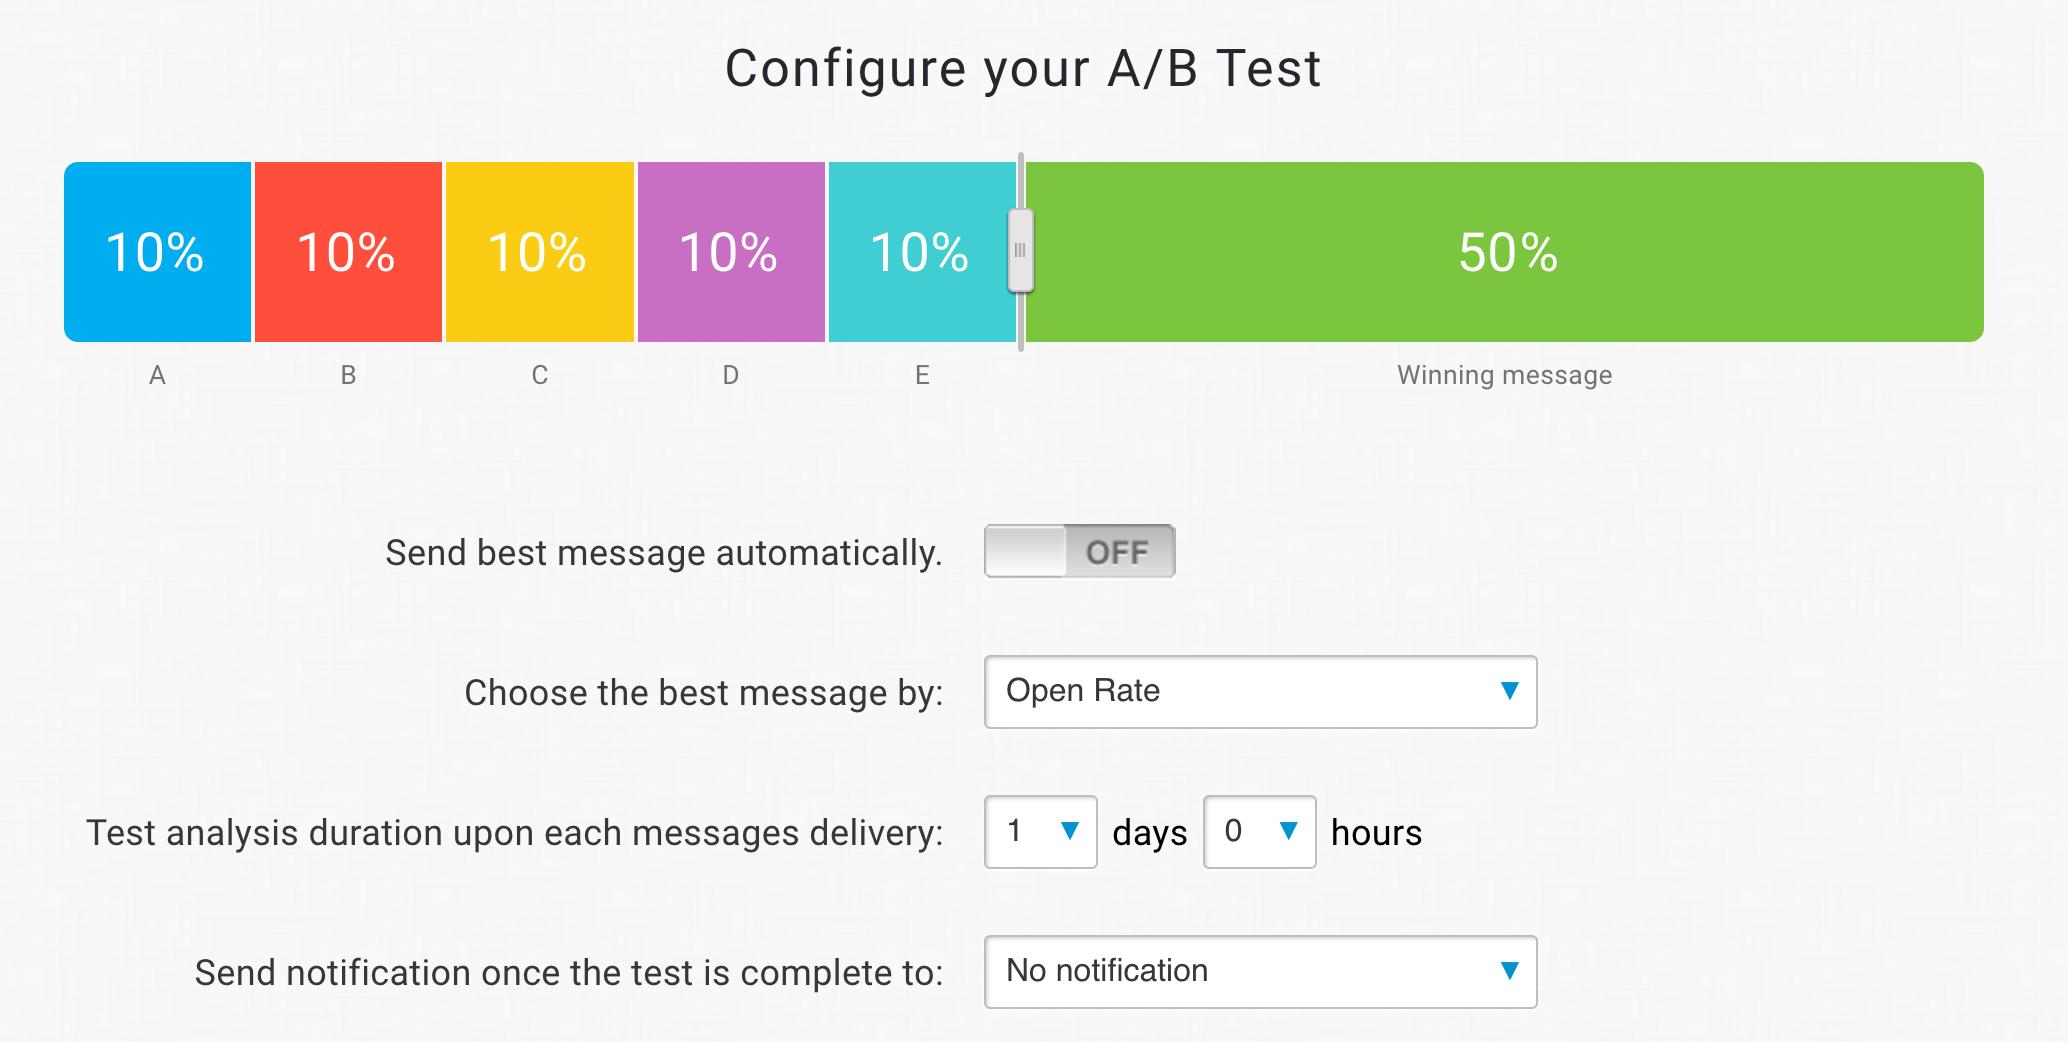 ab test configuration.